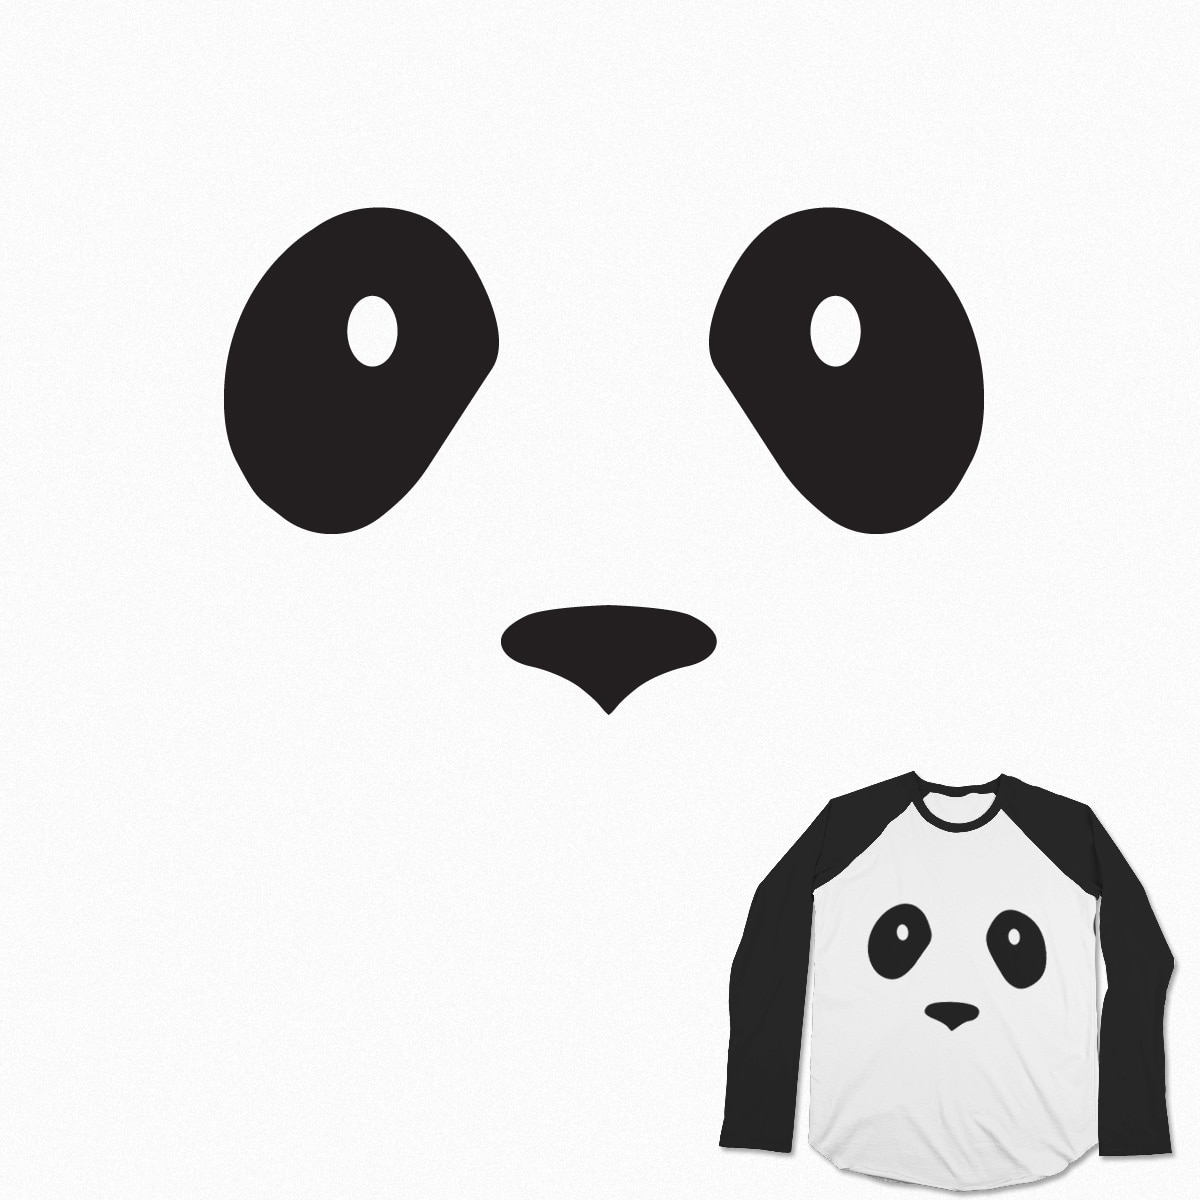 P... p... p... panda! by Szabotage on Threadless